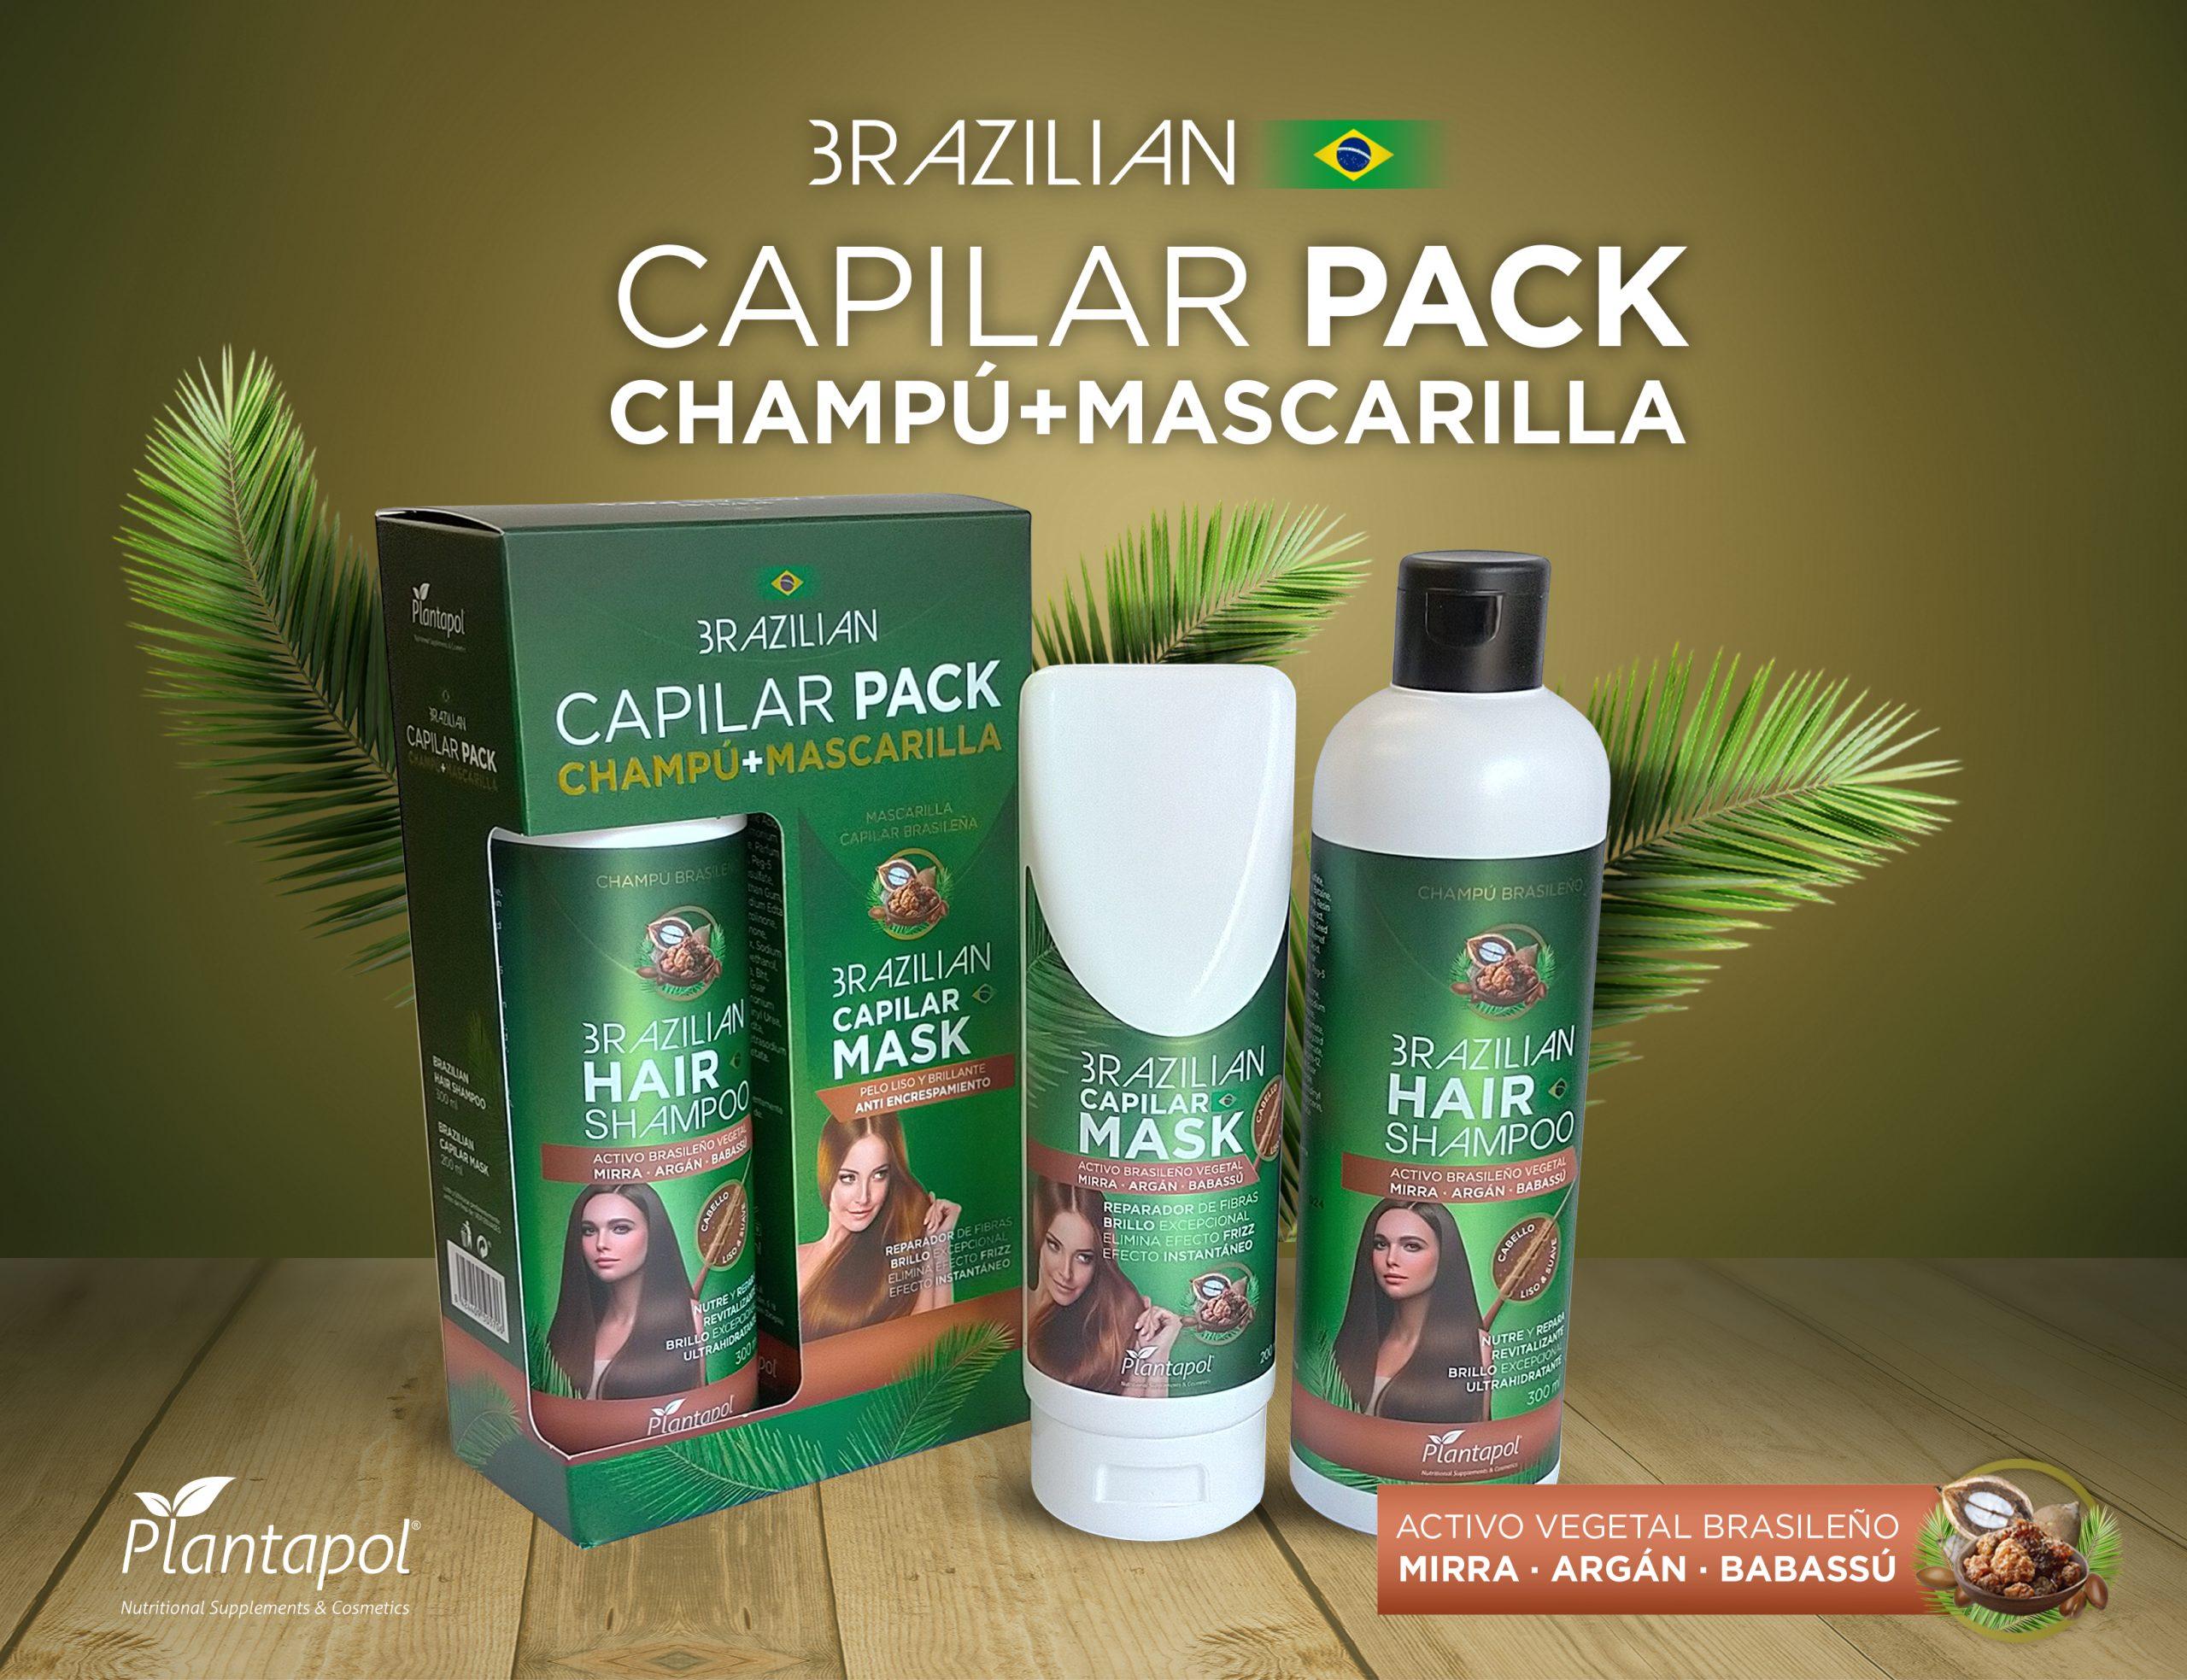 Brazilian Capilar Pack